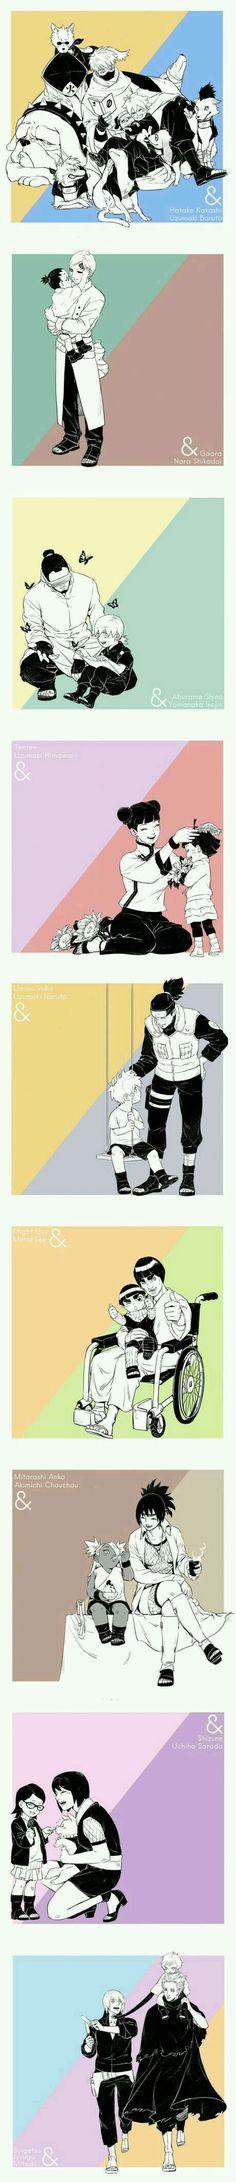 Boruto's gen and Naruto's gen